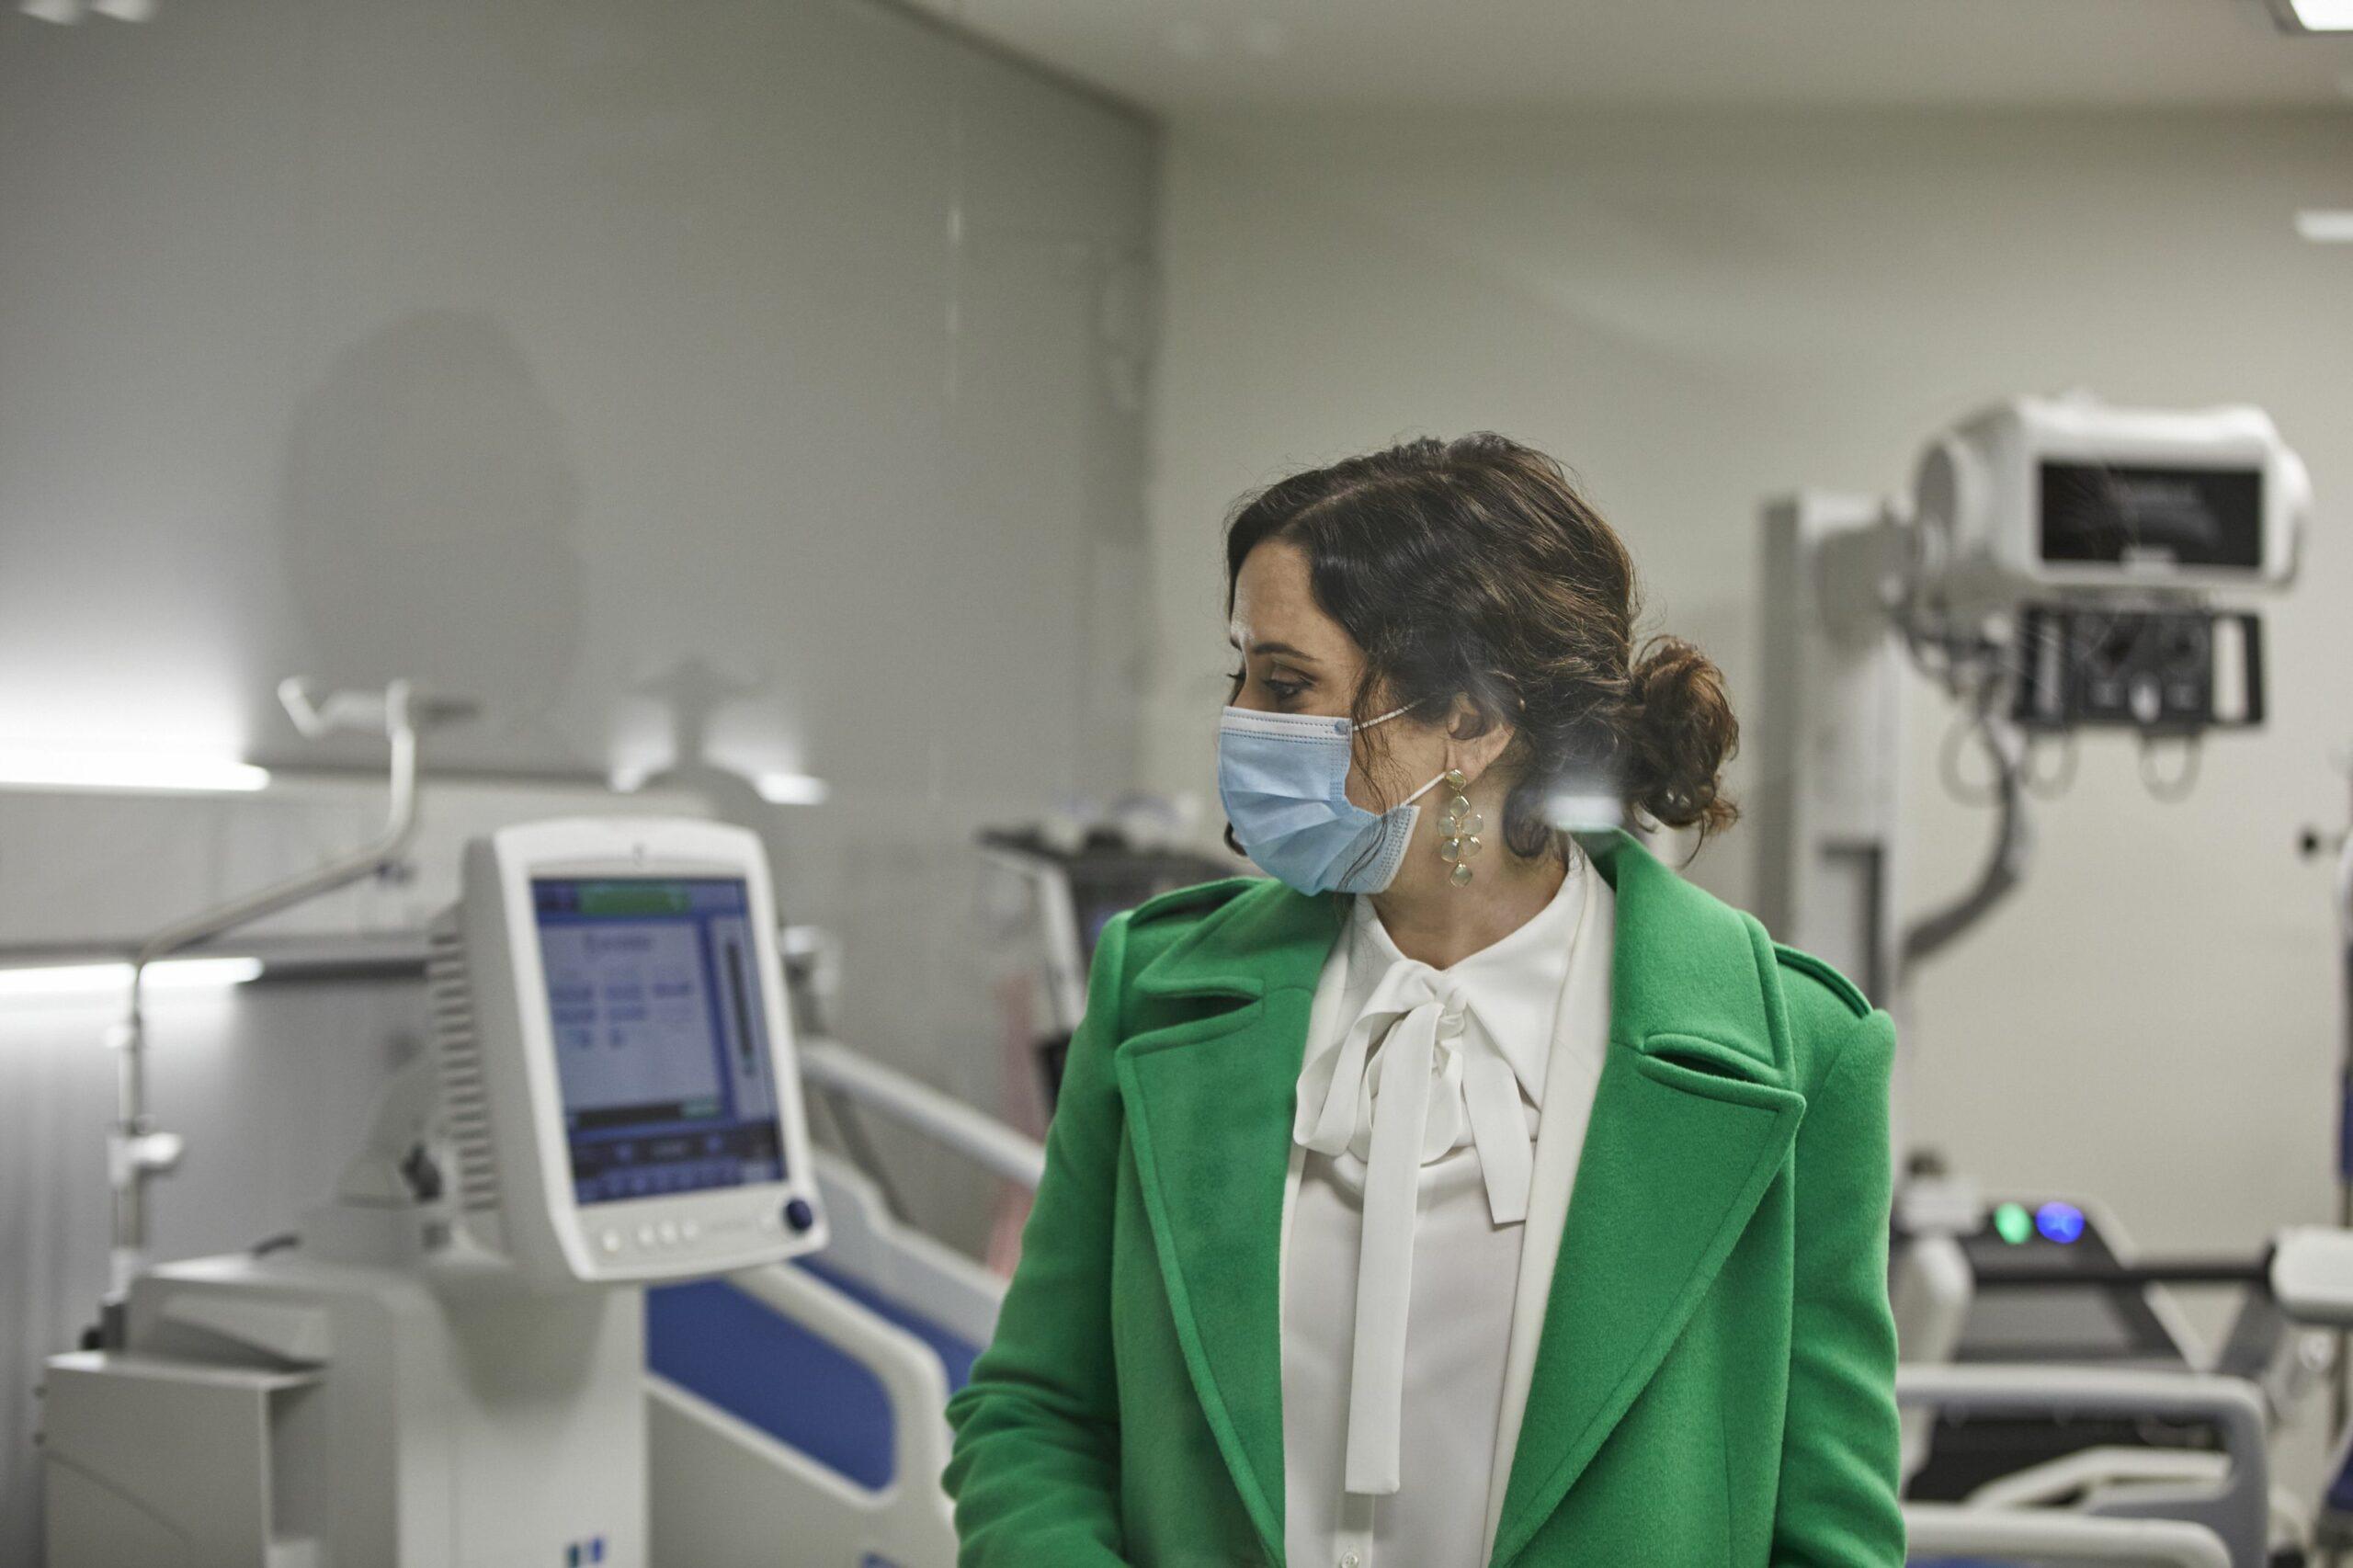 Isabel Díaz Ayuso visita un hospital durant la pandèmia, en una imatge d'arxiu | Europa Press